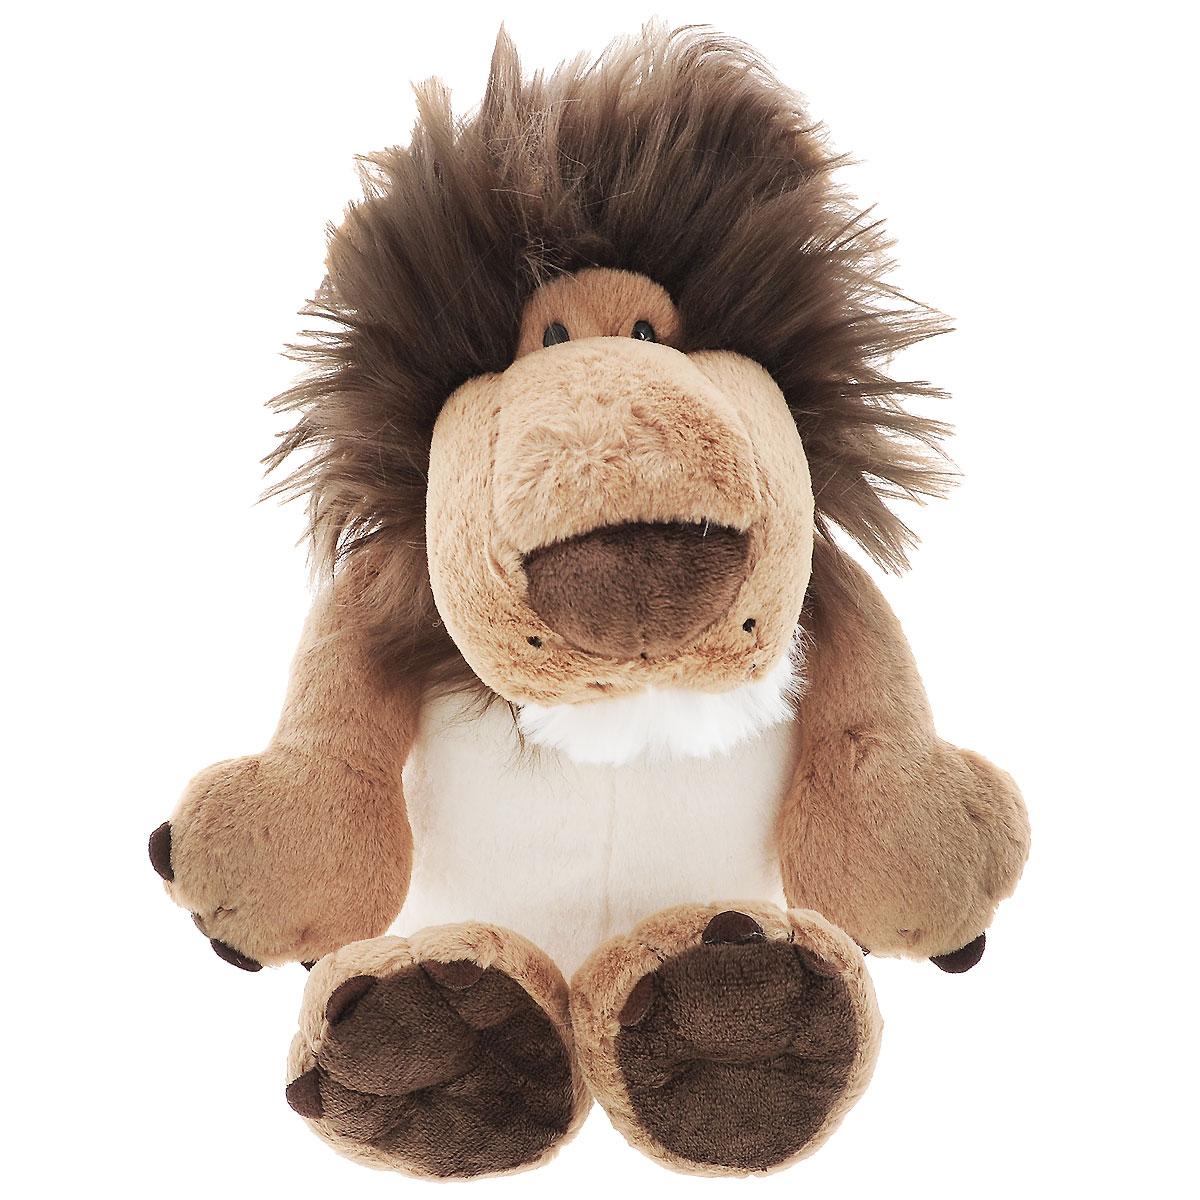 Купить Мягкая игрушка Plush Apple Лев лохматый , 23 см, Kids First Toys Co., LTD